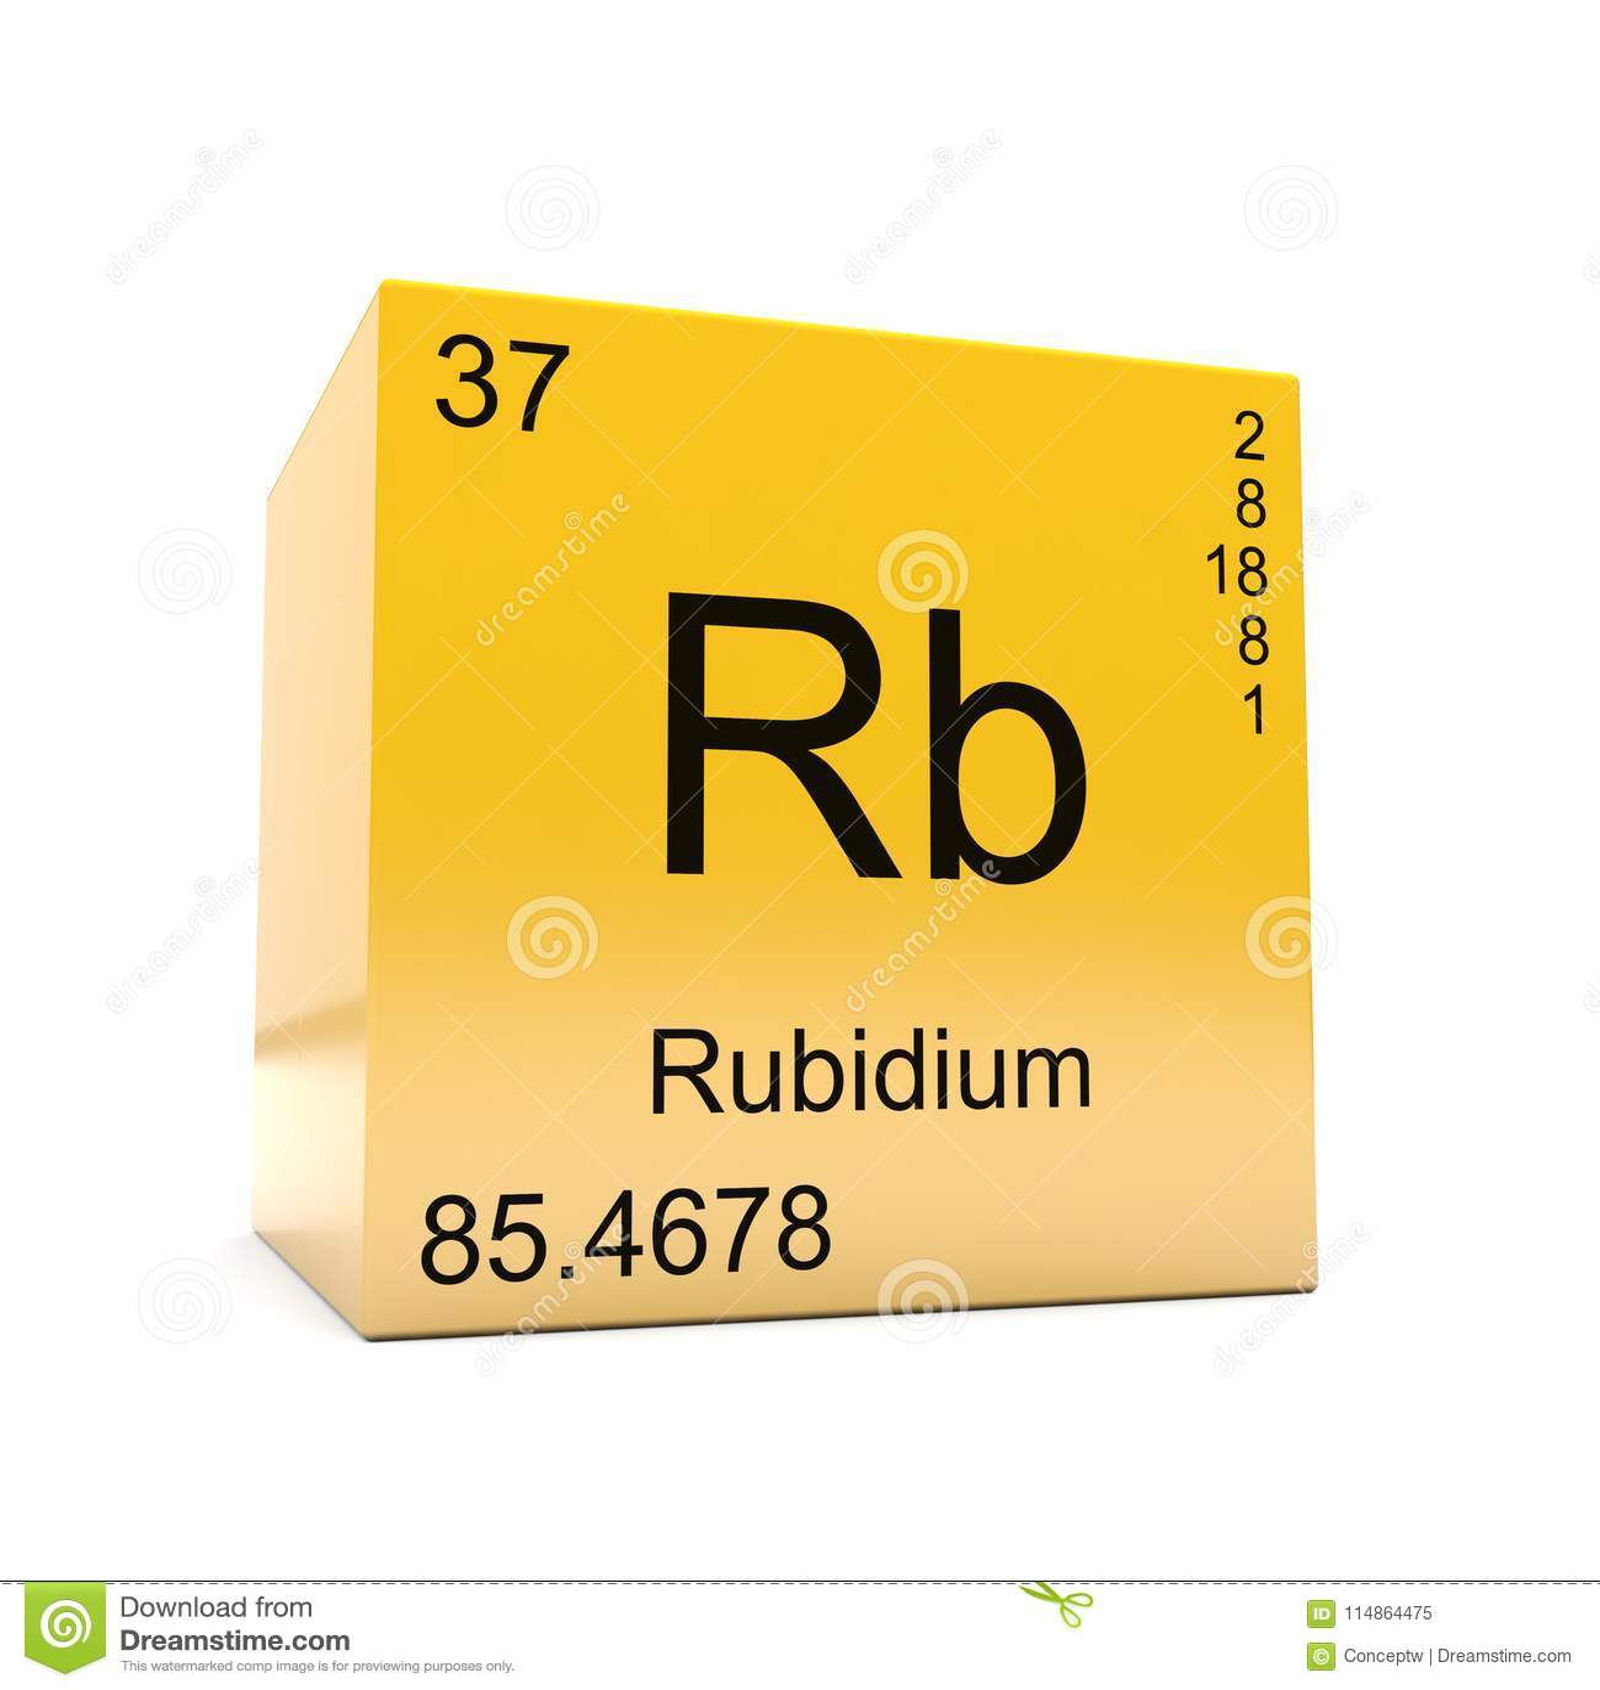 Rubidium Chemical Element Symbol From Periodic Table Stock